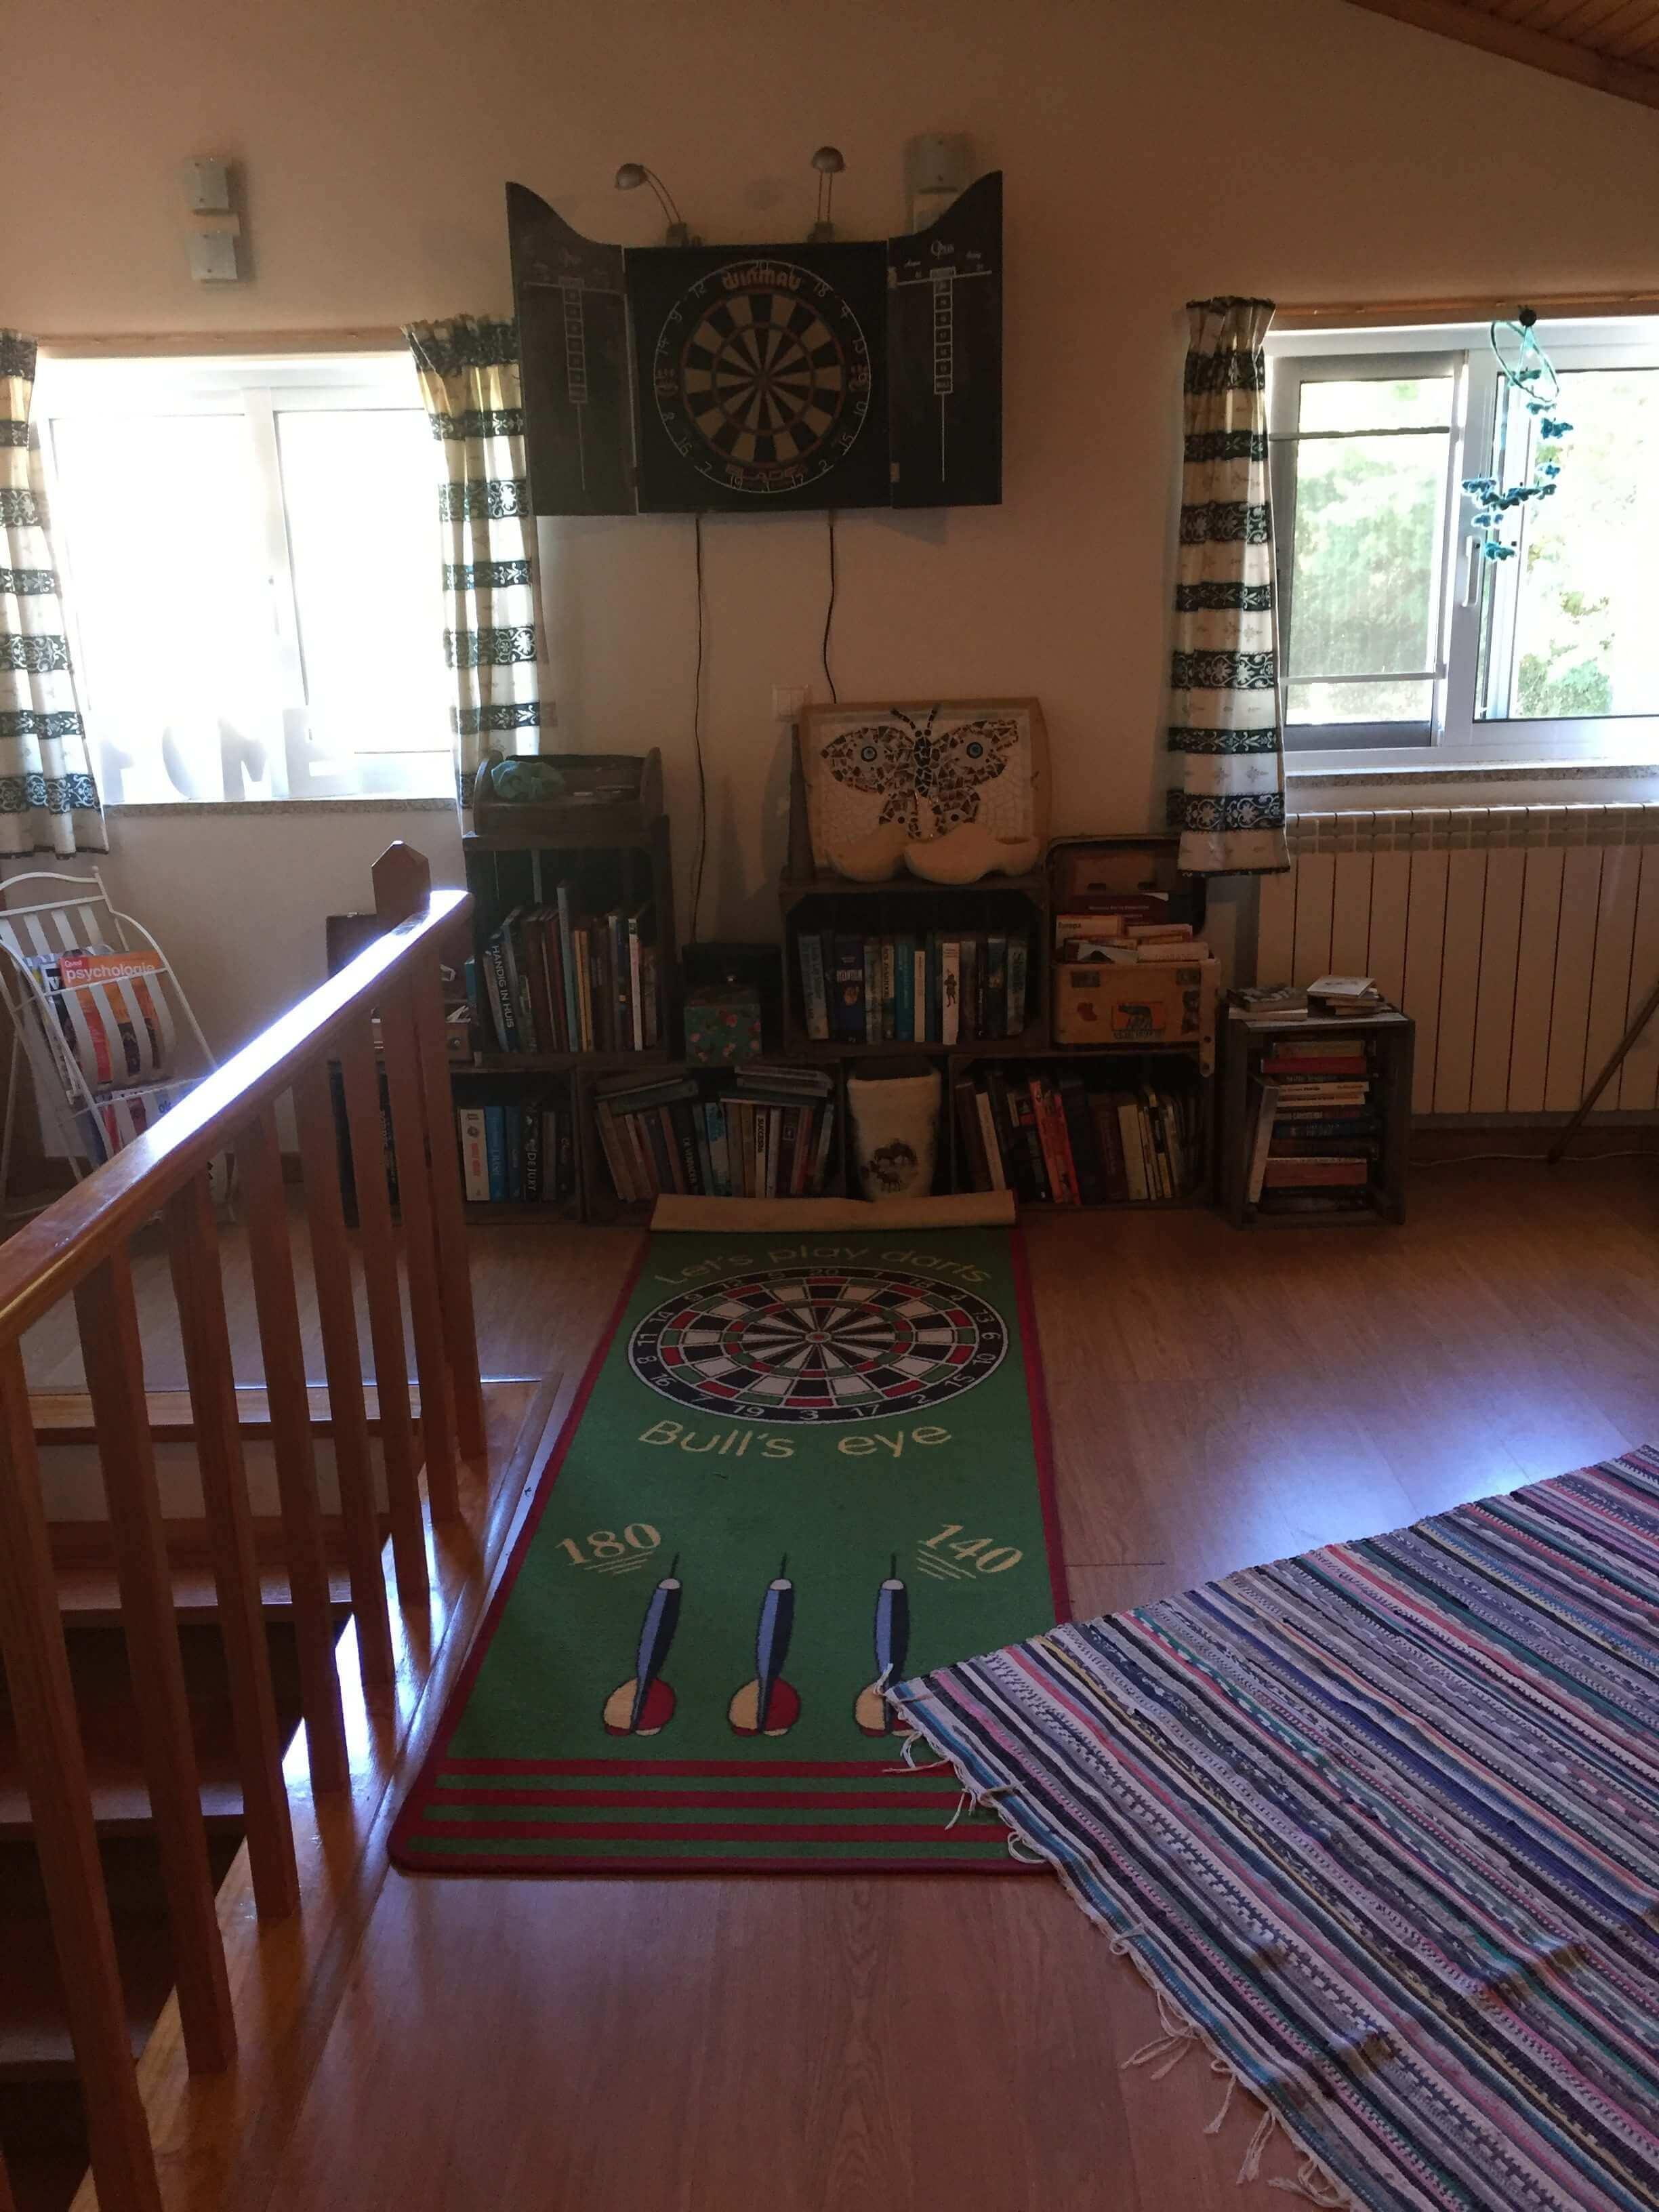 bibliotheek en spelletjesruimte